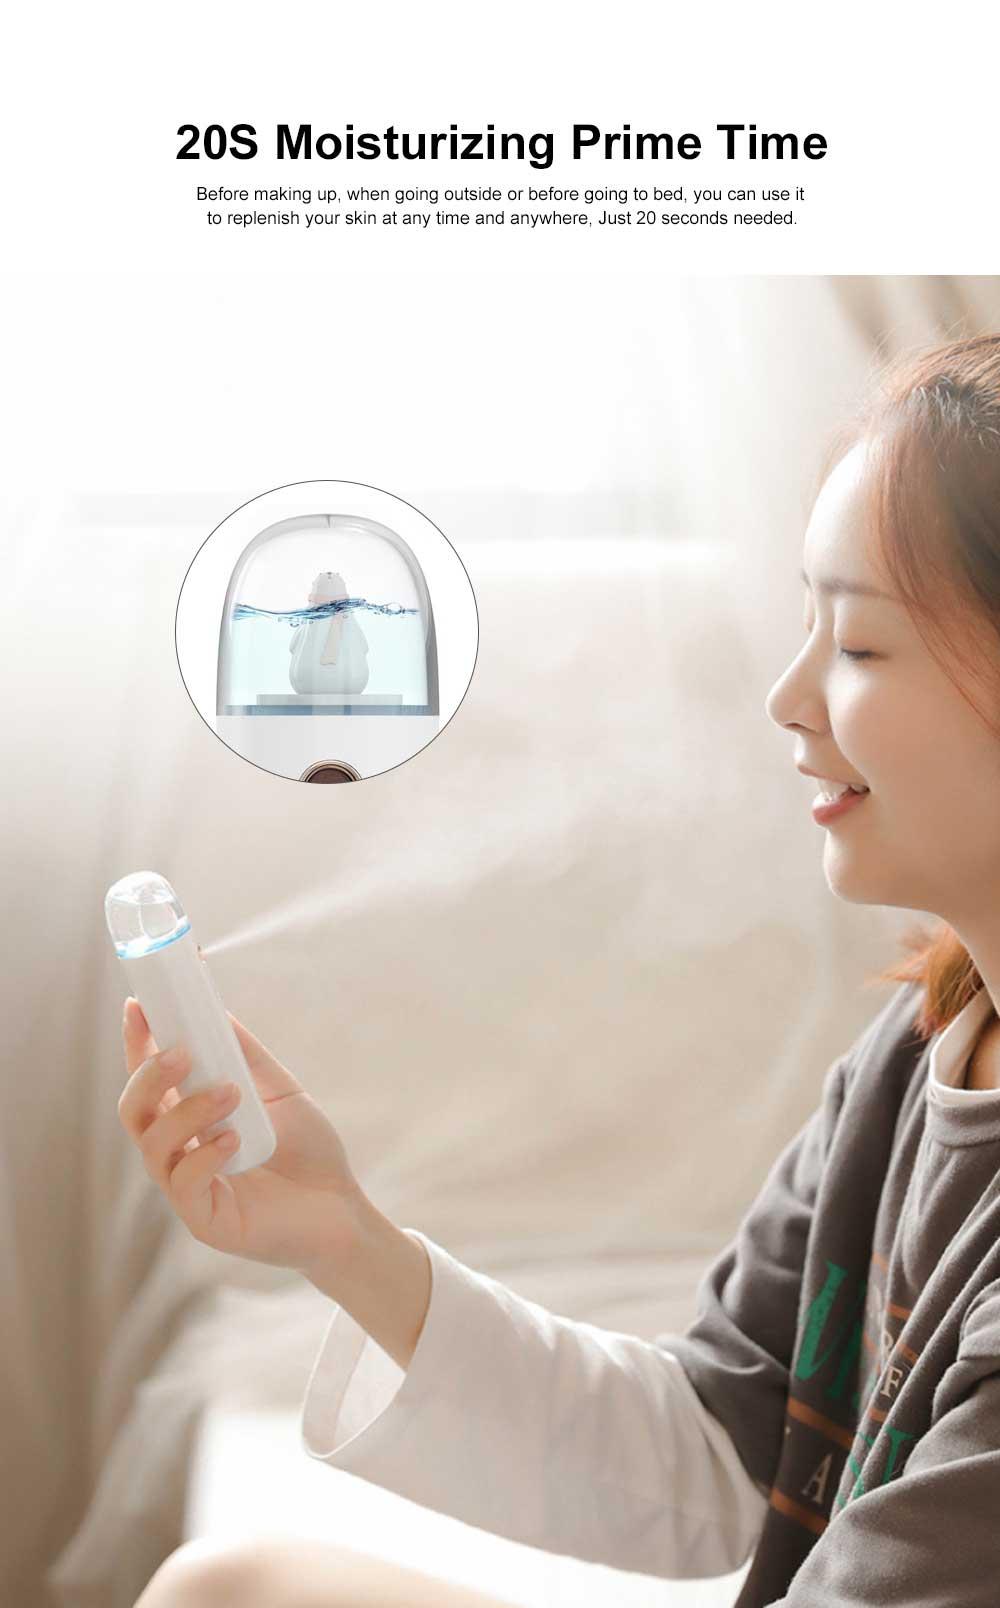 Mini Face Humidifier Nano Spray Hydrator USB Rechargeable Portable Facial Sprayer Machine for Face Skin Caring 1